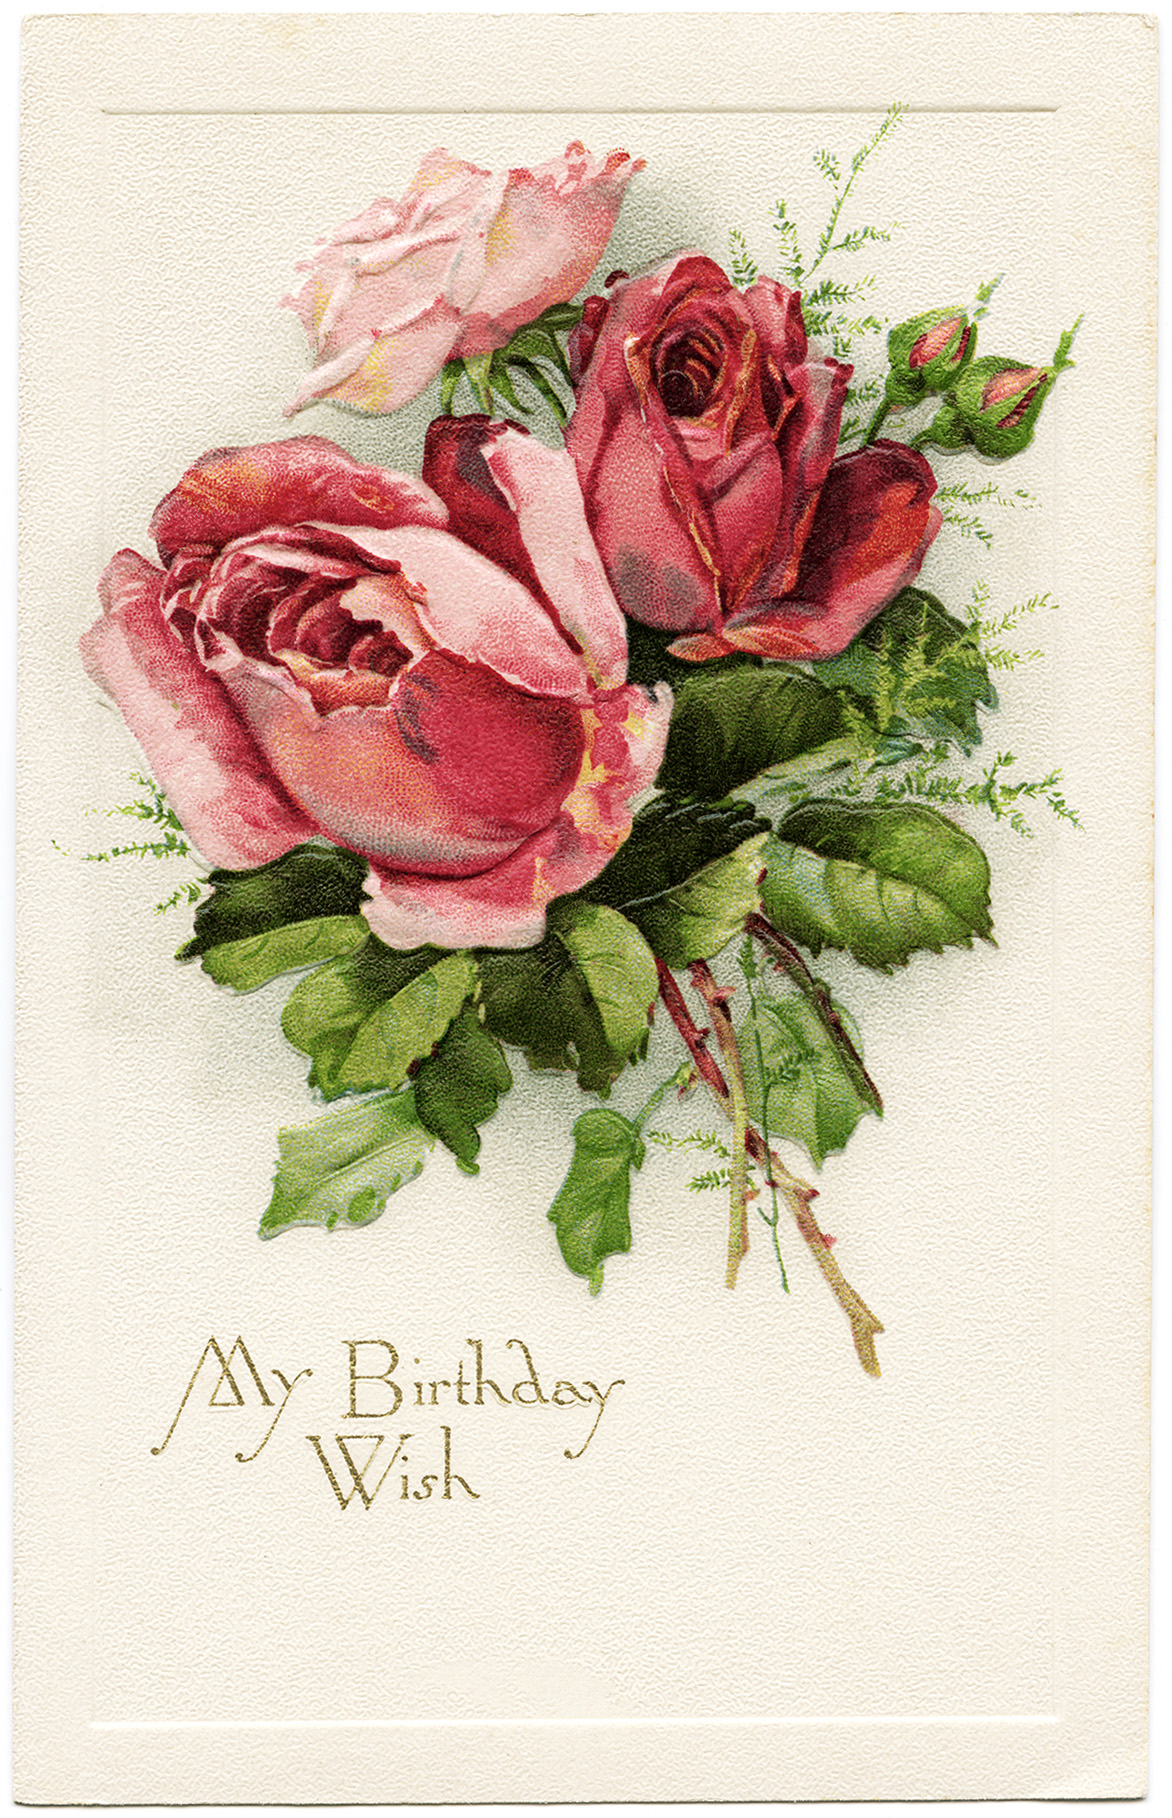 Free Vintage Image My Birthday Wish Roses Postcard Old